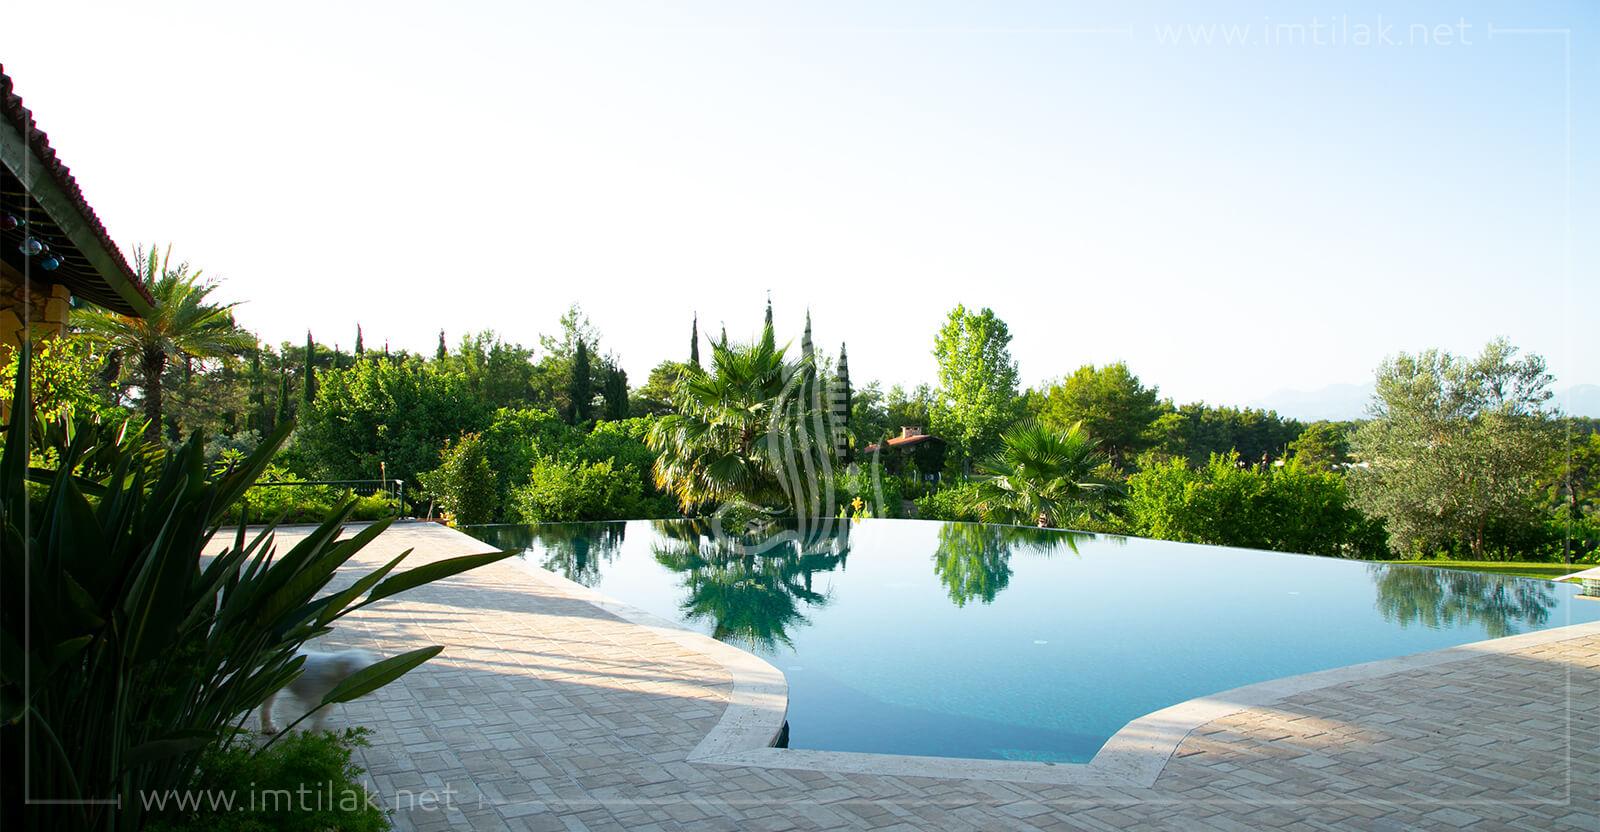 Kursunlu villa and farm  IMT - 779